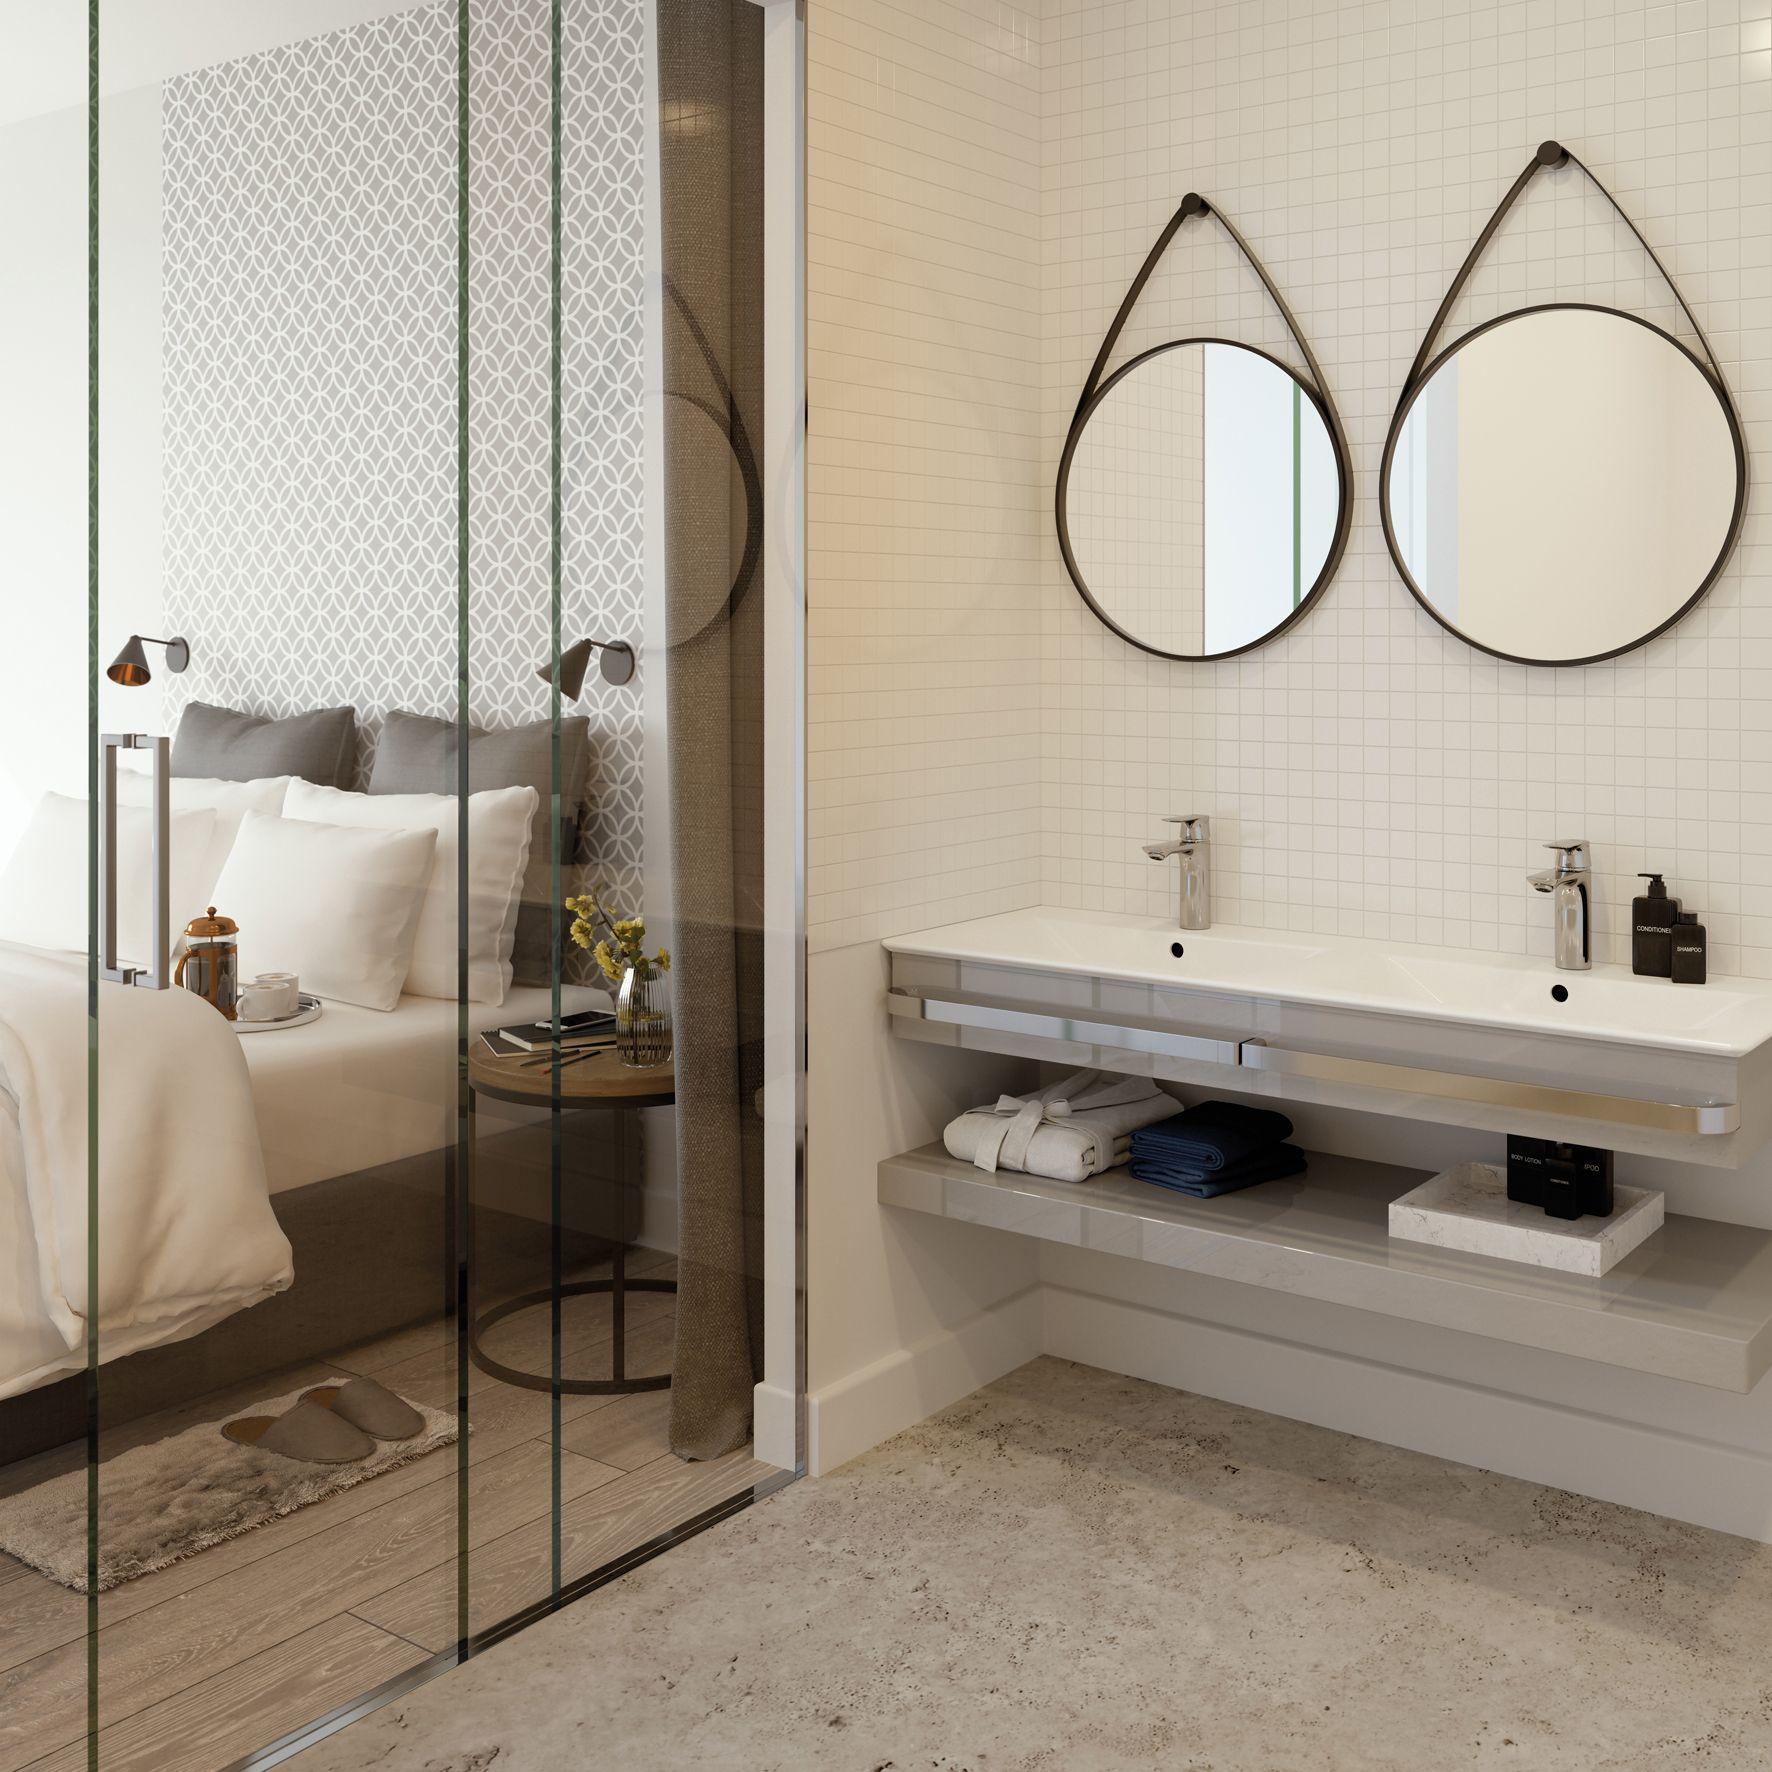 Salle De Bain Tunisie Decor ~ robinetterie connect air d ideal standard salle de bains